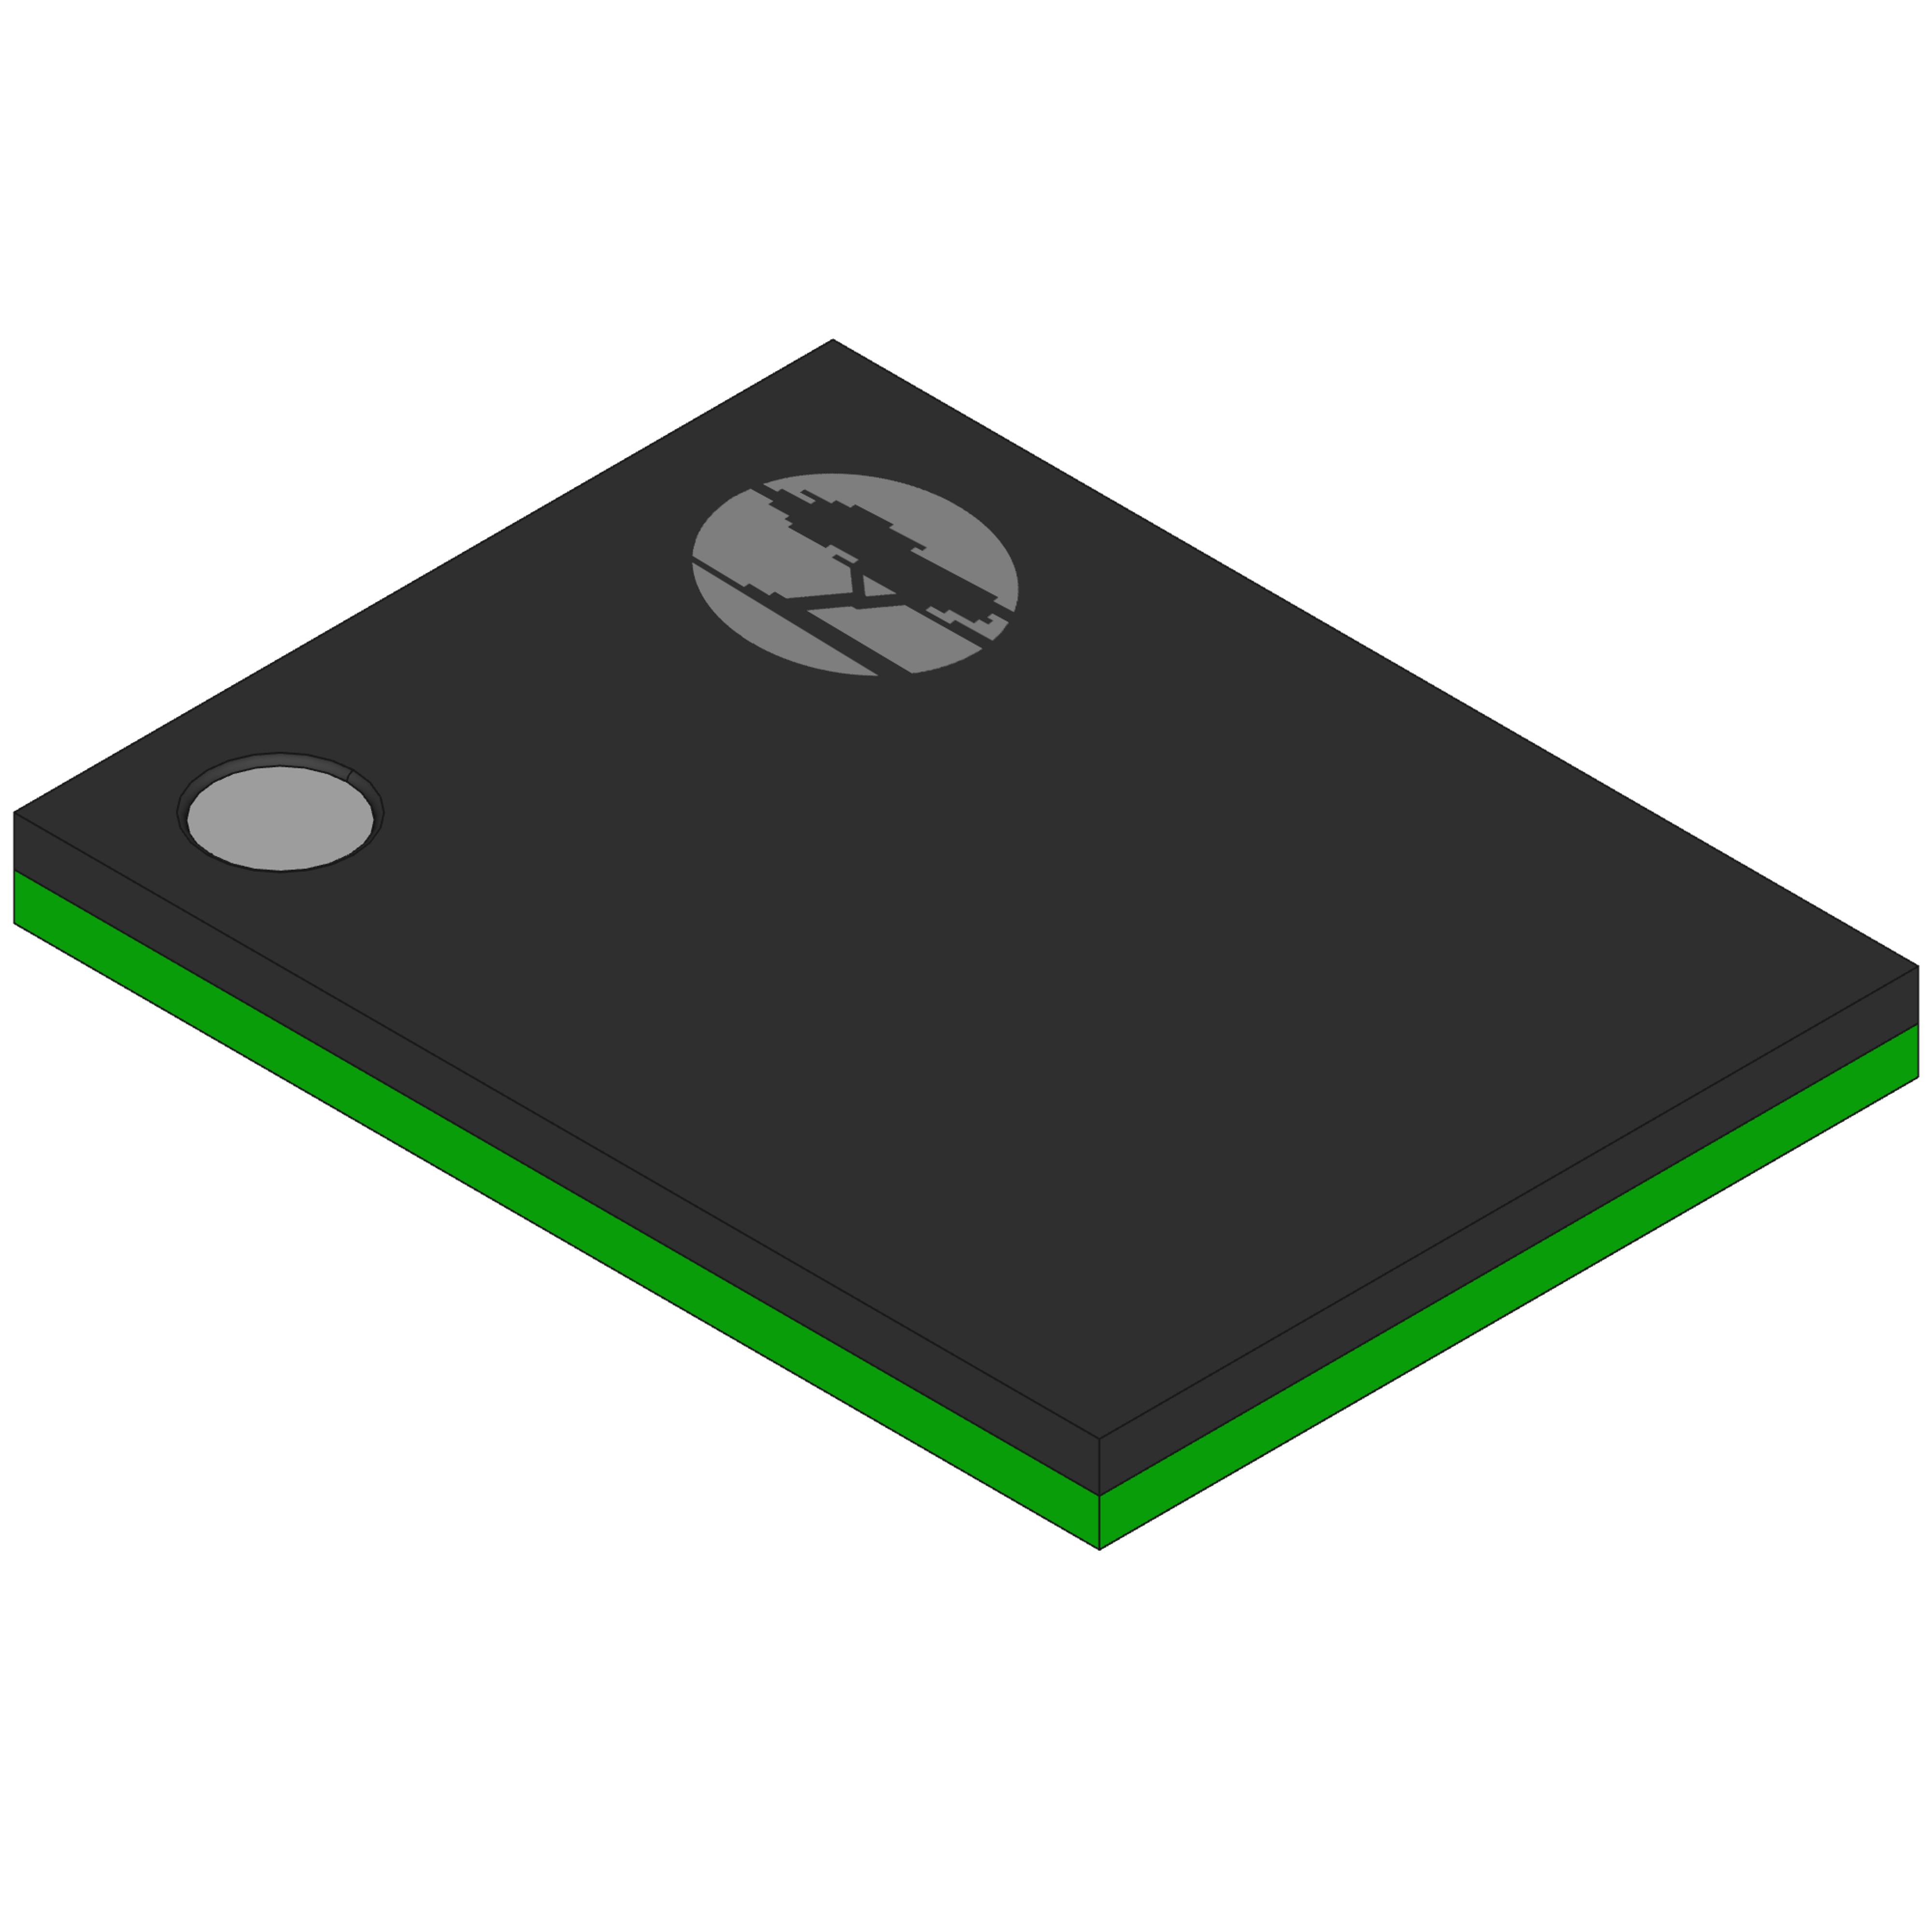 Image of Rochester Electronics' CY7C1011CV33-10BAJXE